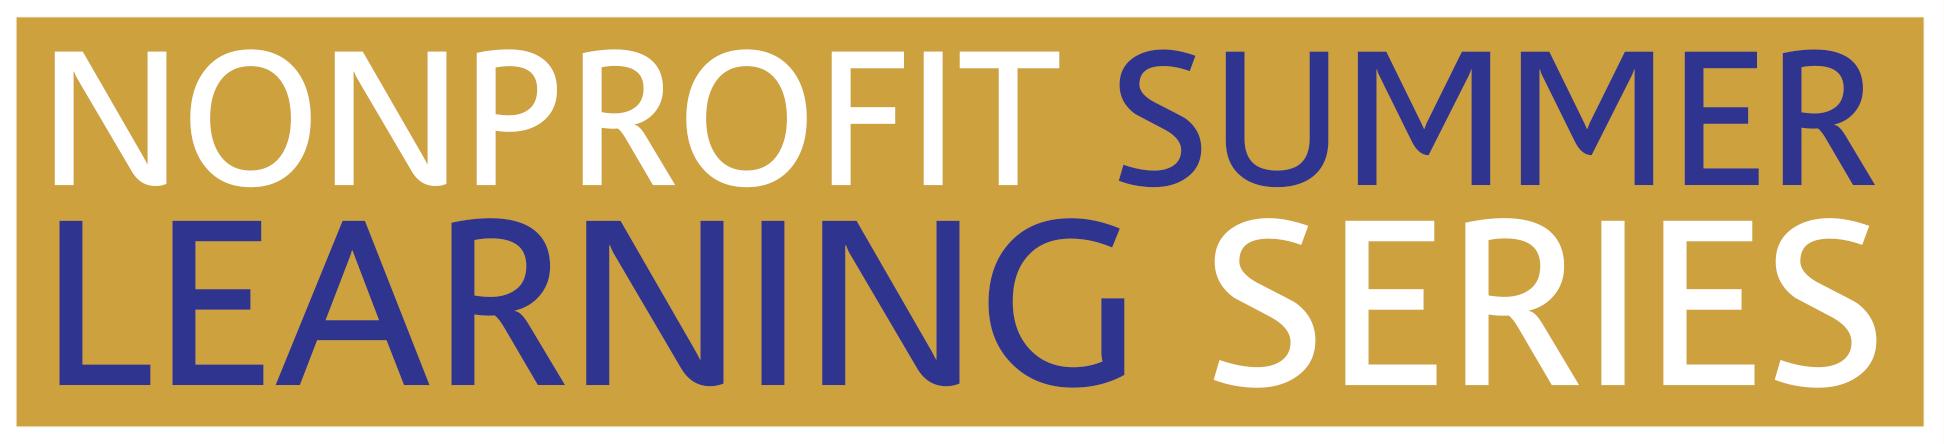 Philanthropy Ohio Nonprofit Summer Learning Series